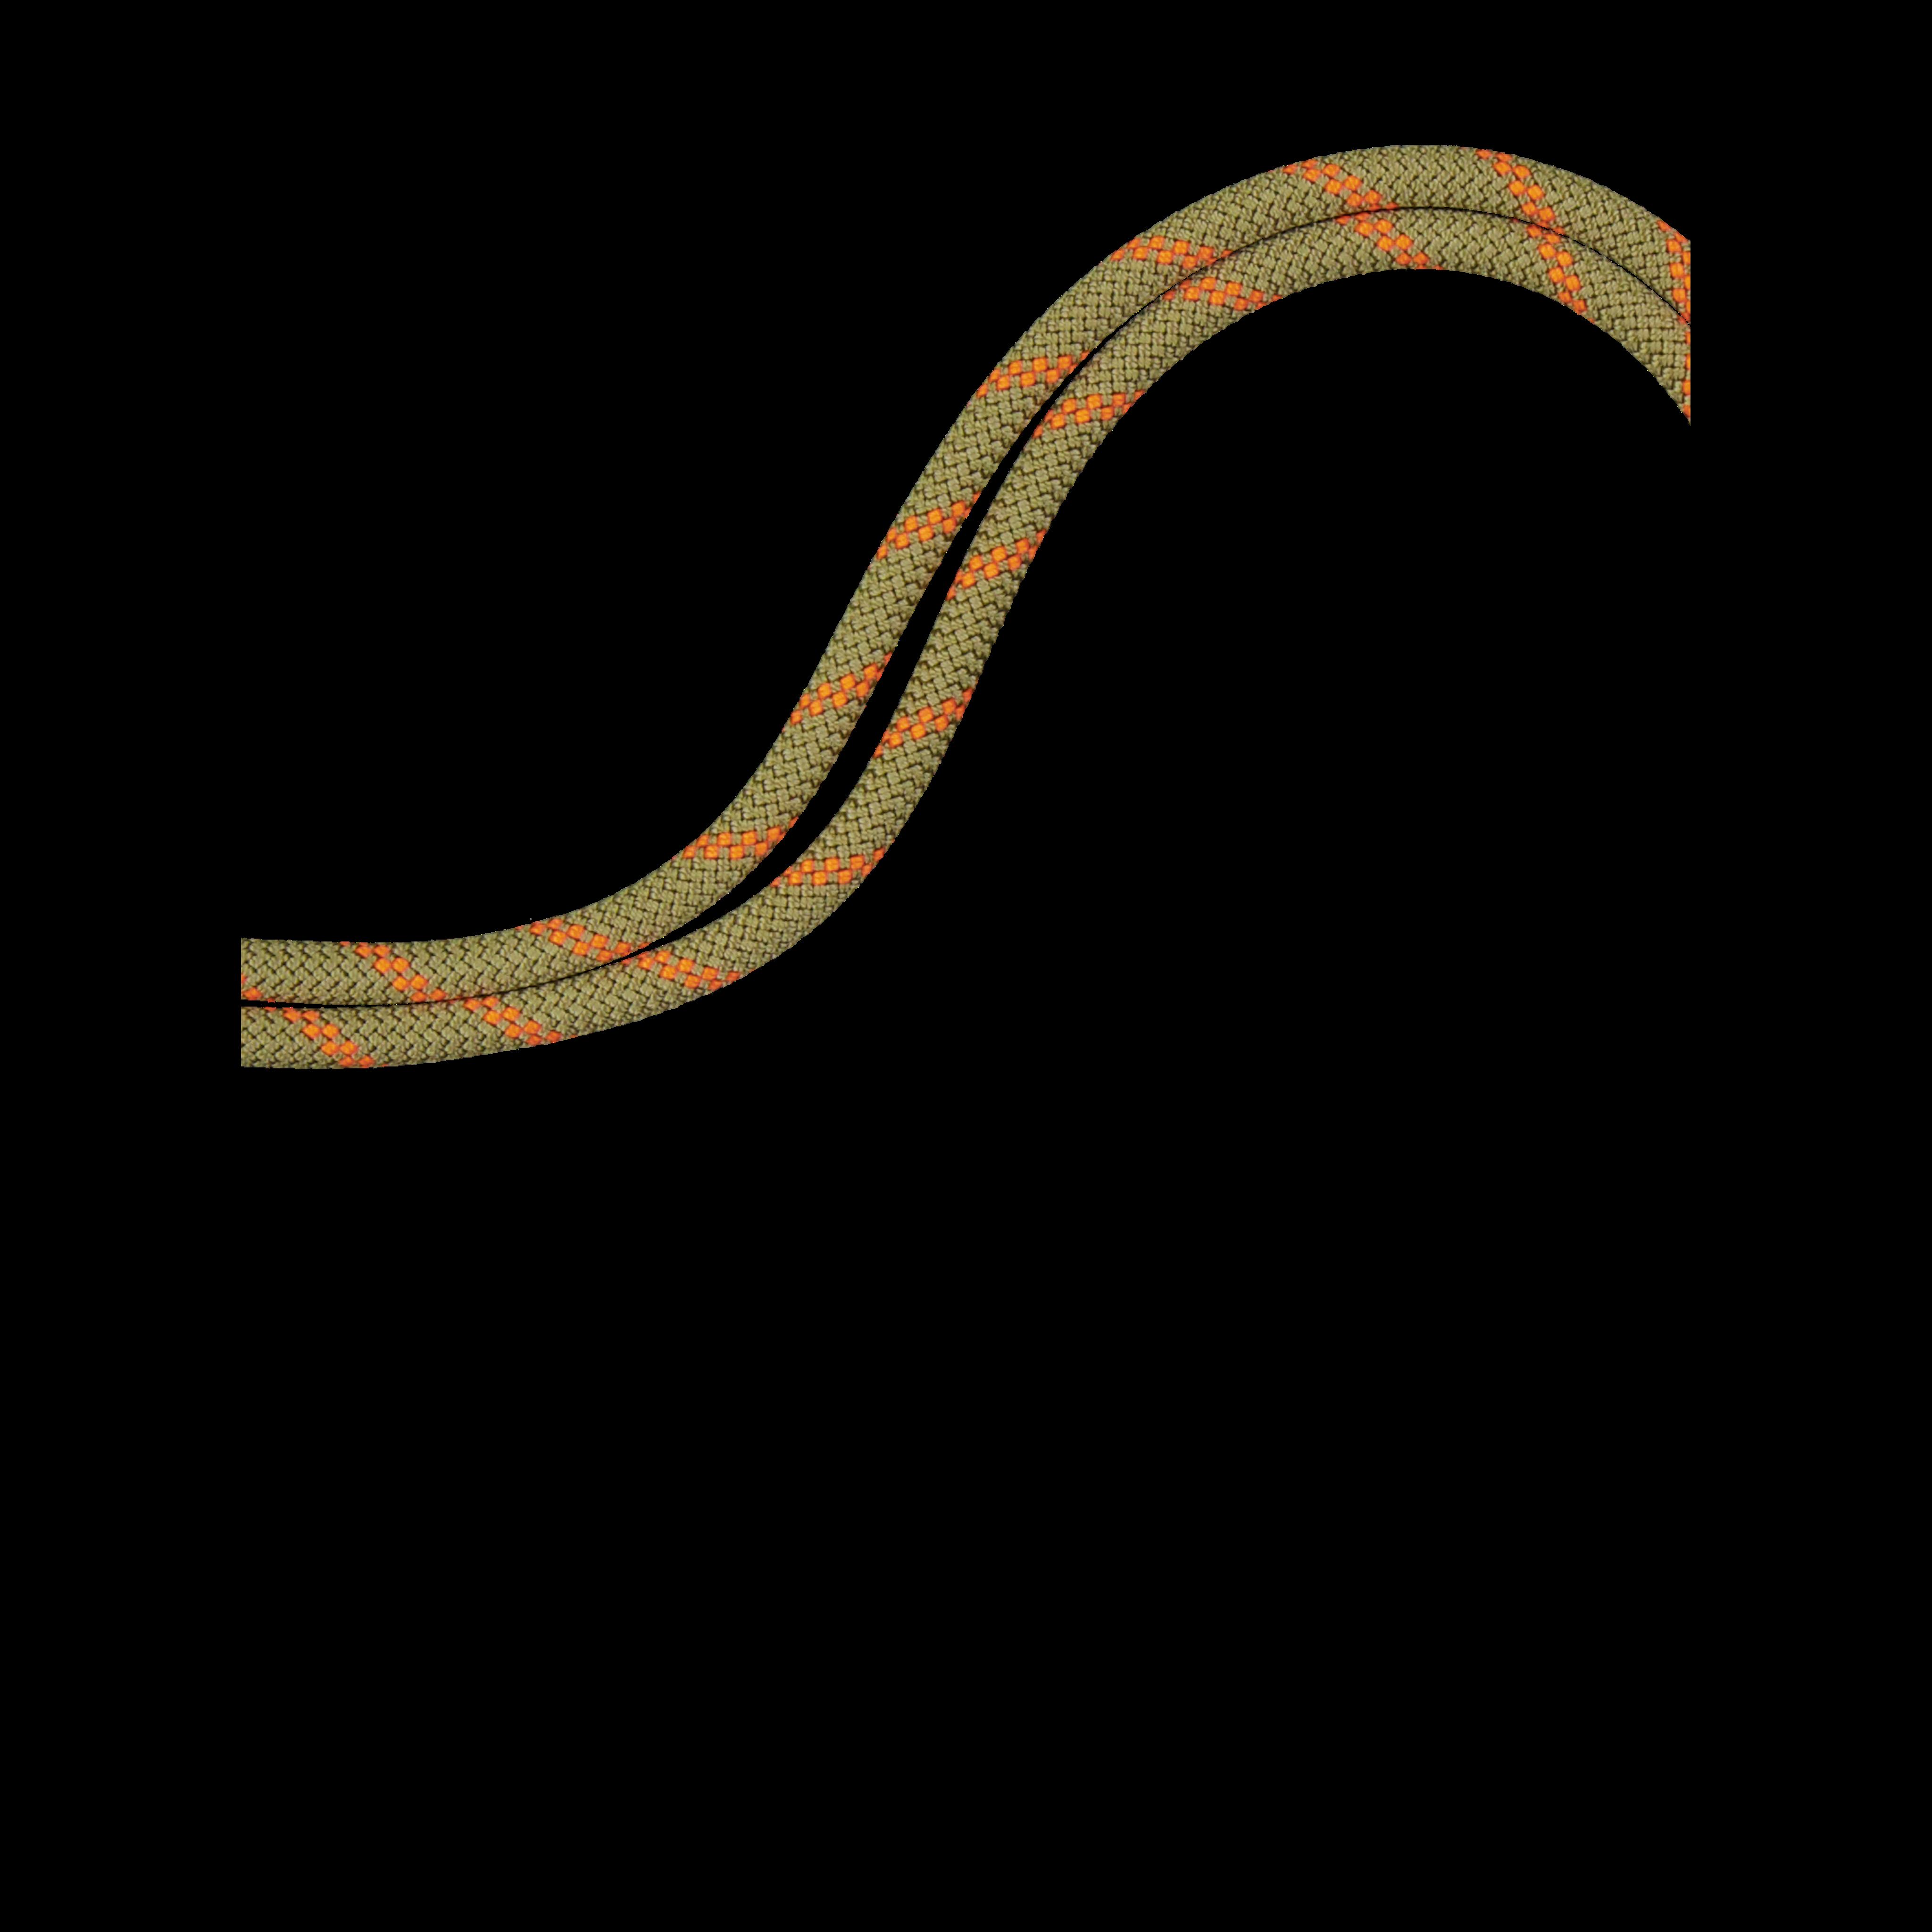 8.0 Alpine Dry Rope product image